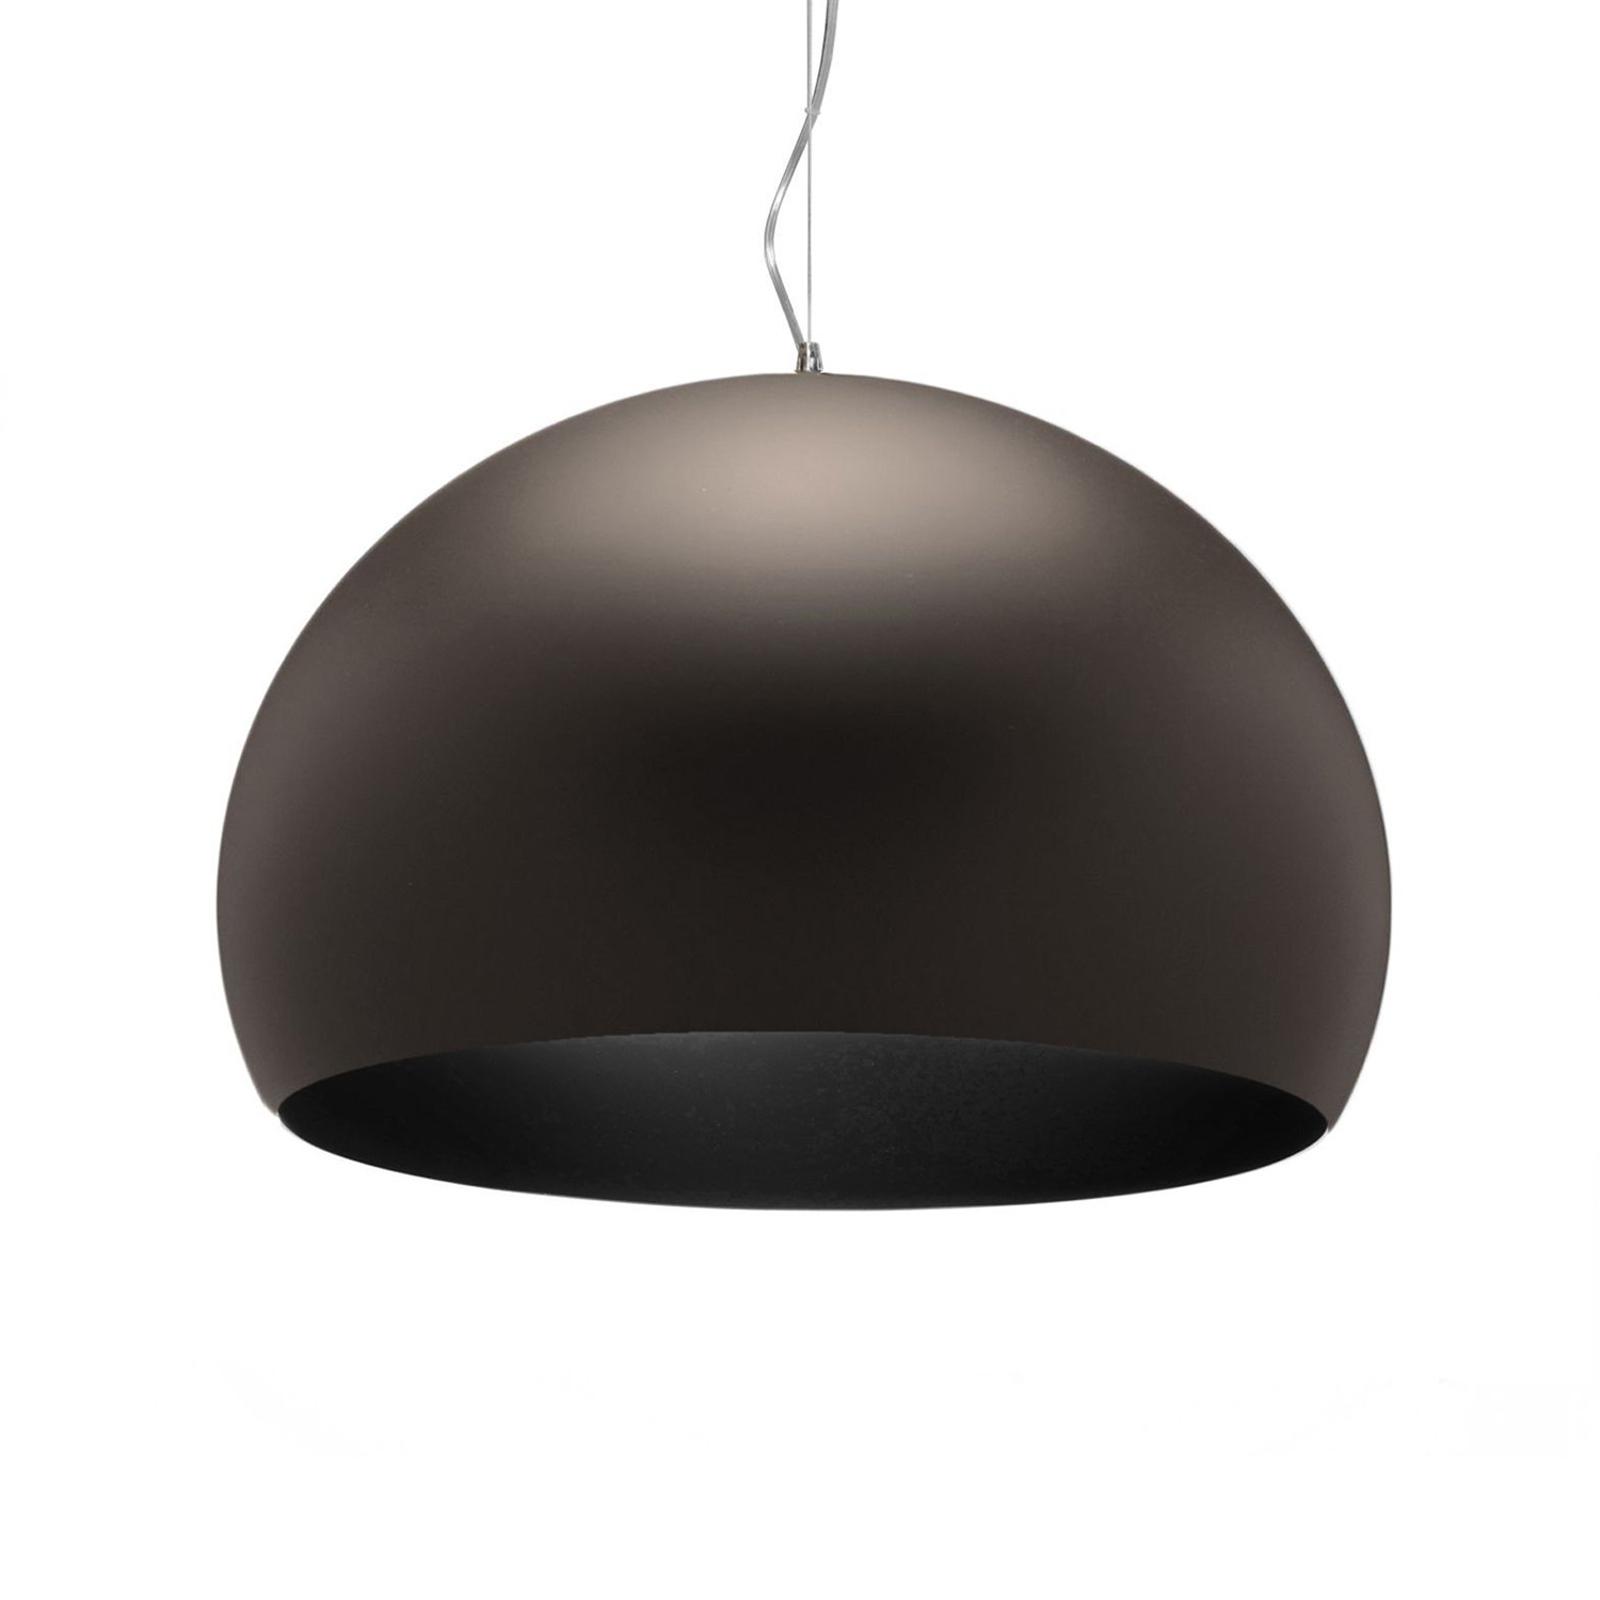 Kartell FL/Y - LED-Pendellampe, braun matt